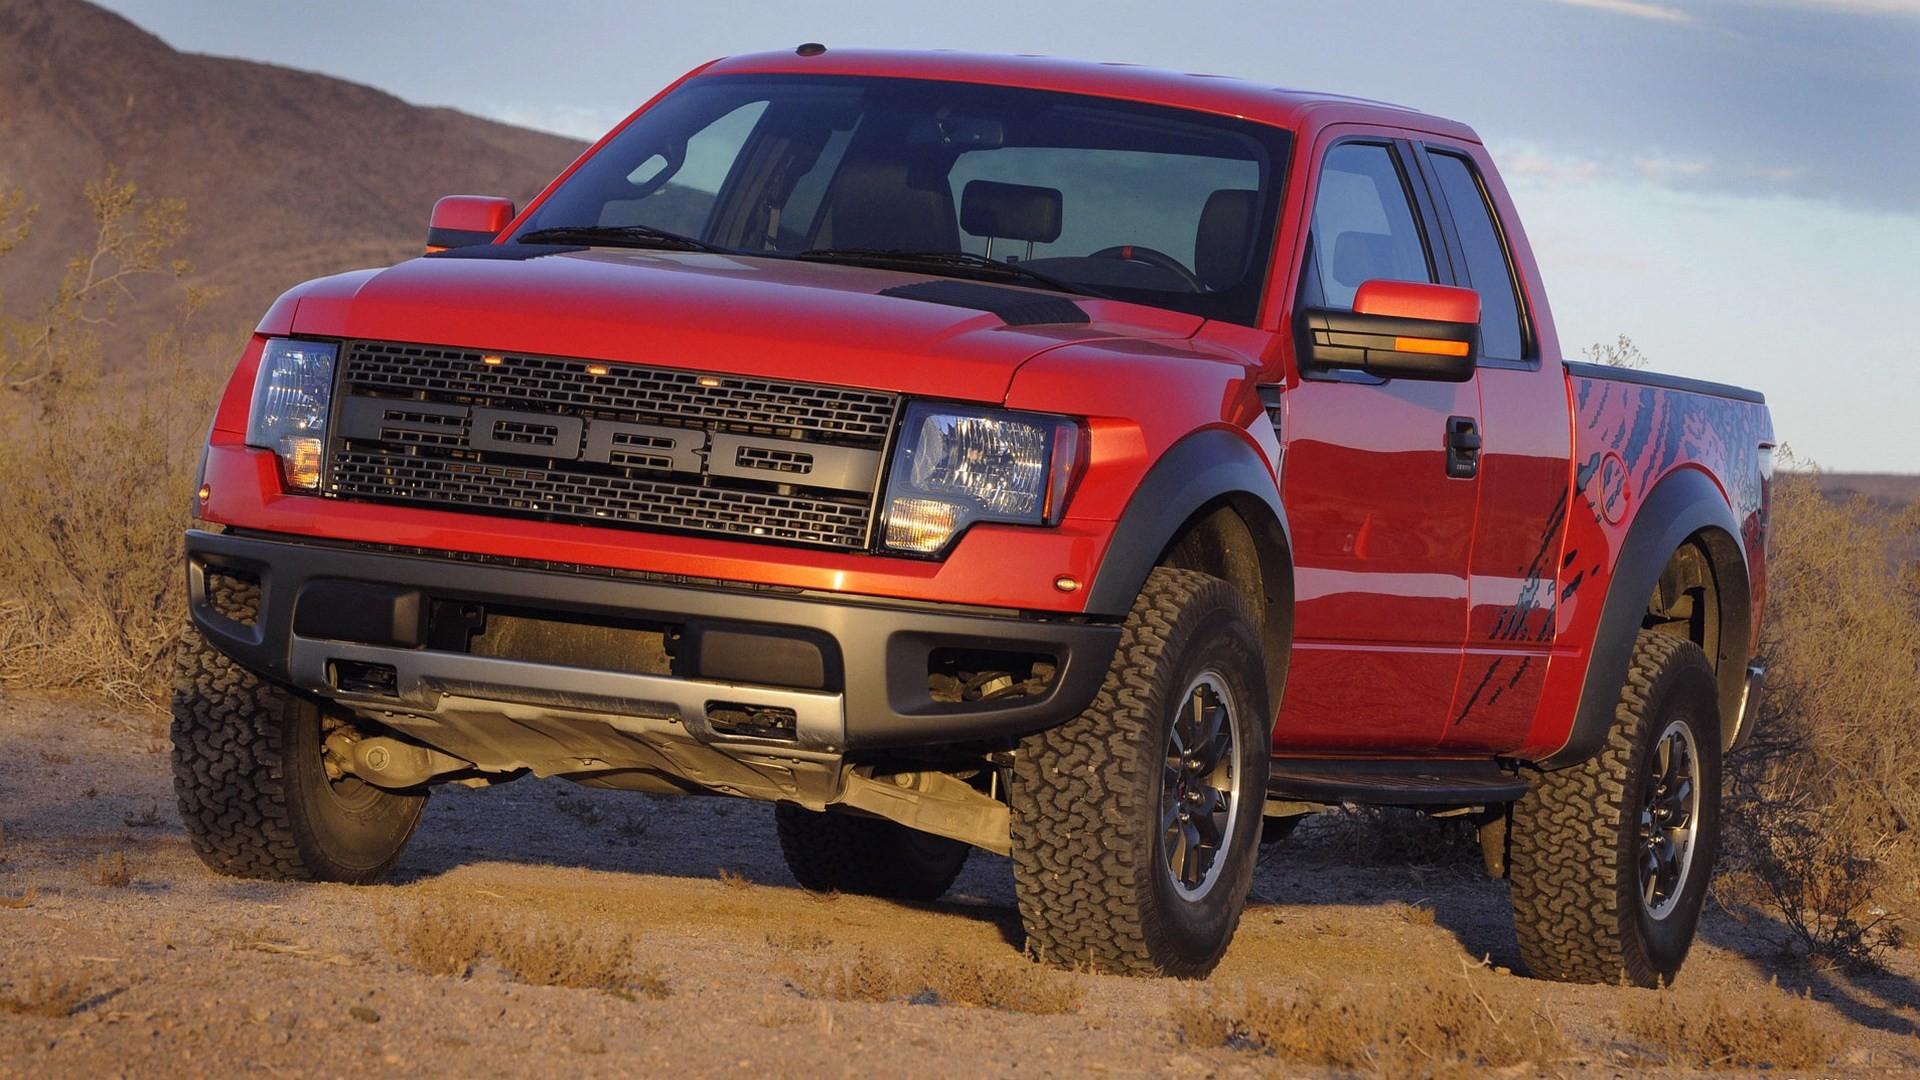 Ford Truck Wallpaper 47995